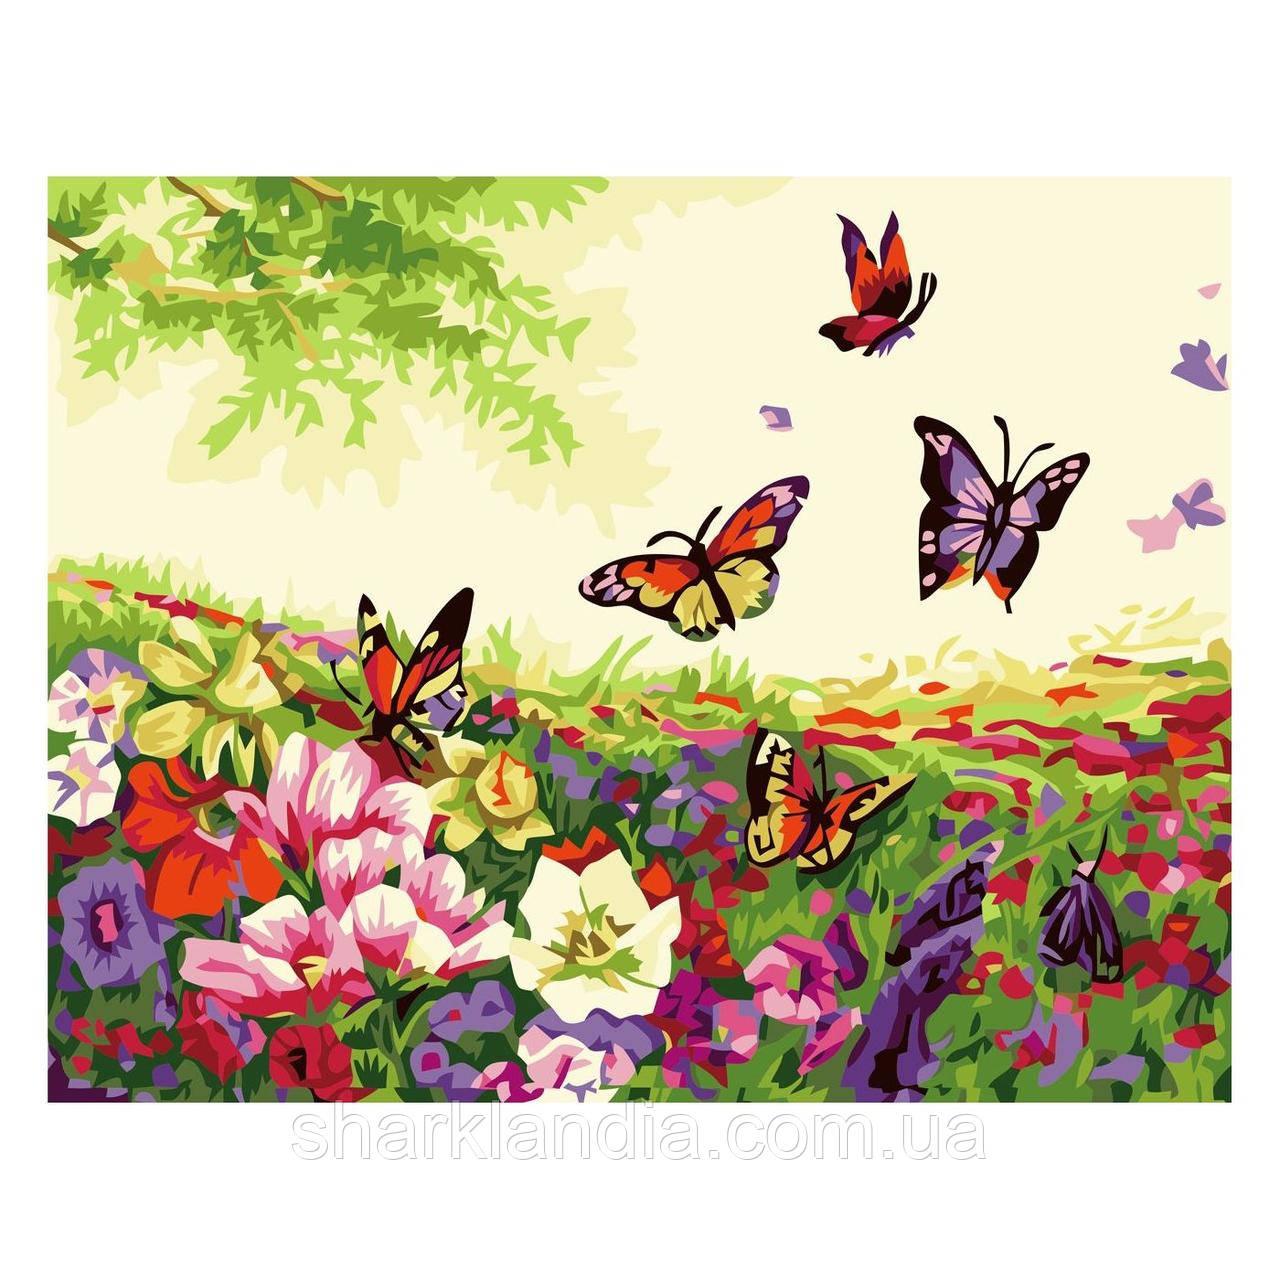 Картина по номерам Бабочки в поле цветов 30х40 см Strateg Раскраски